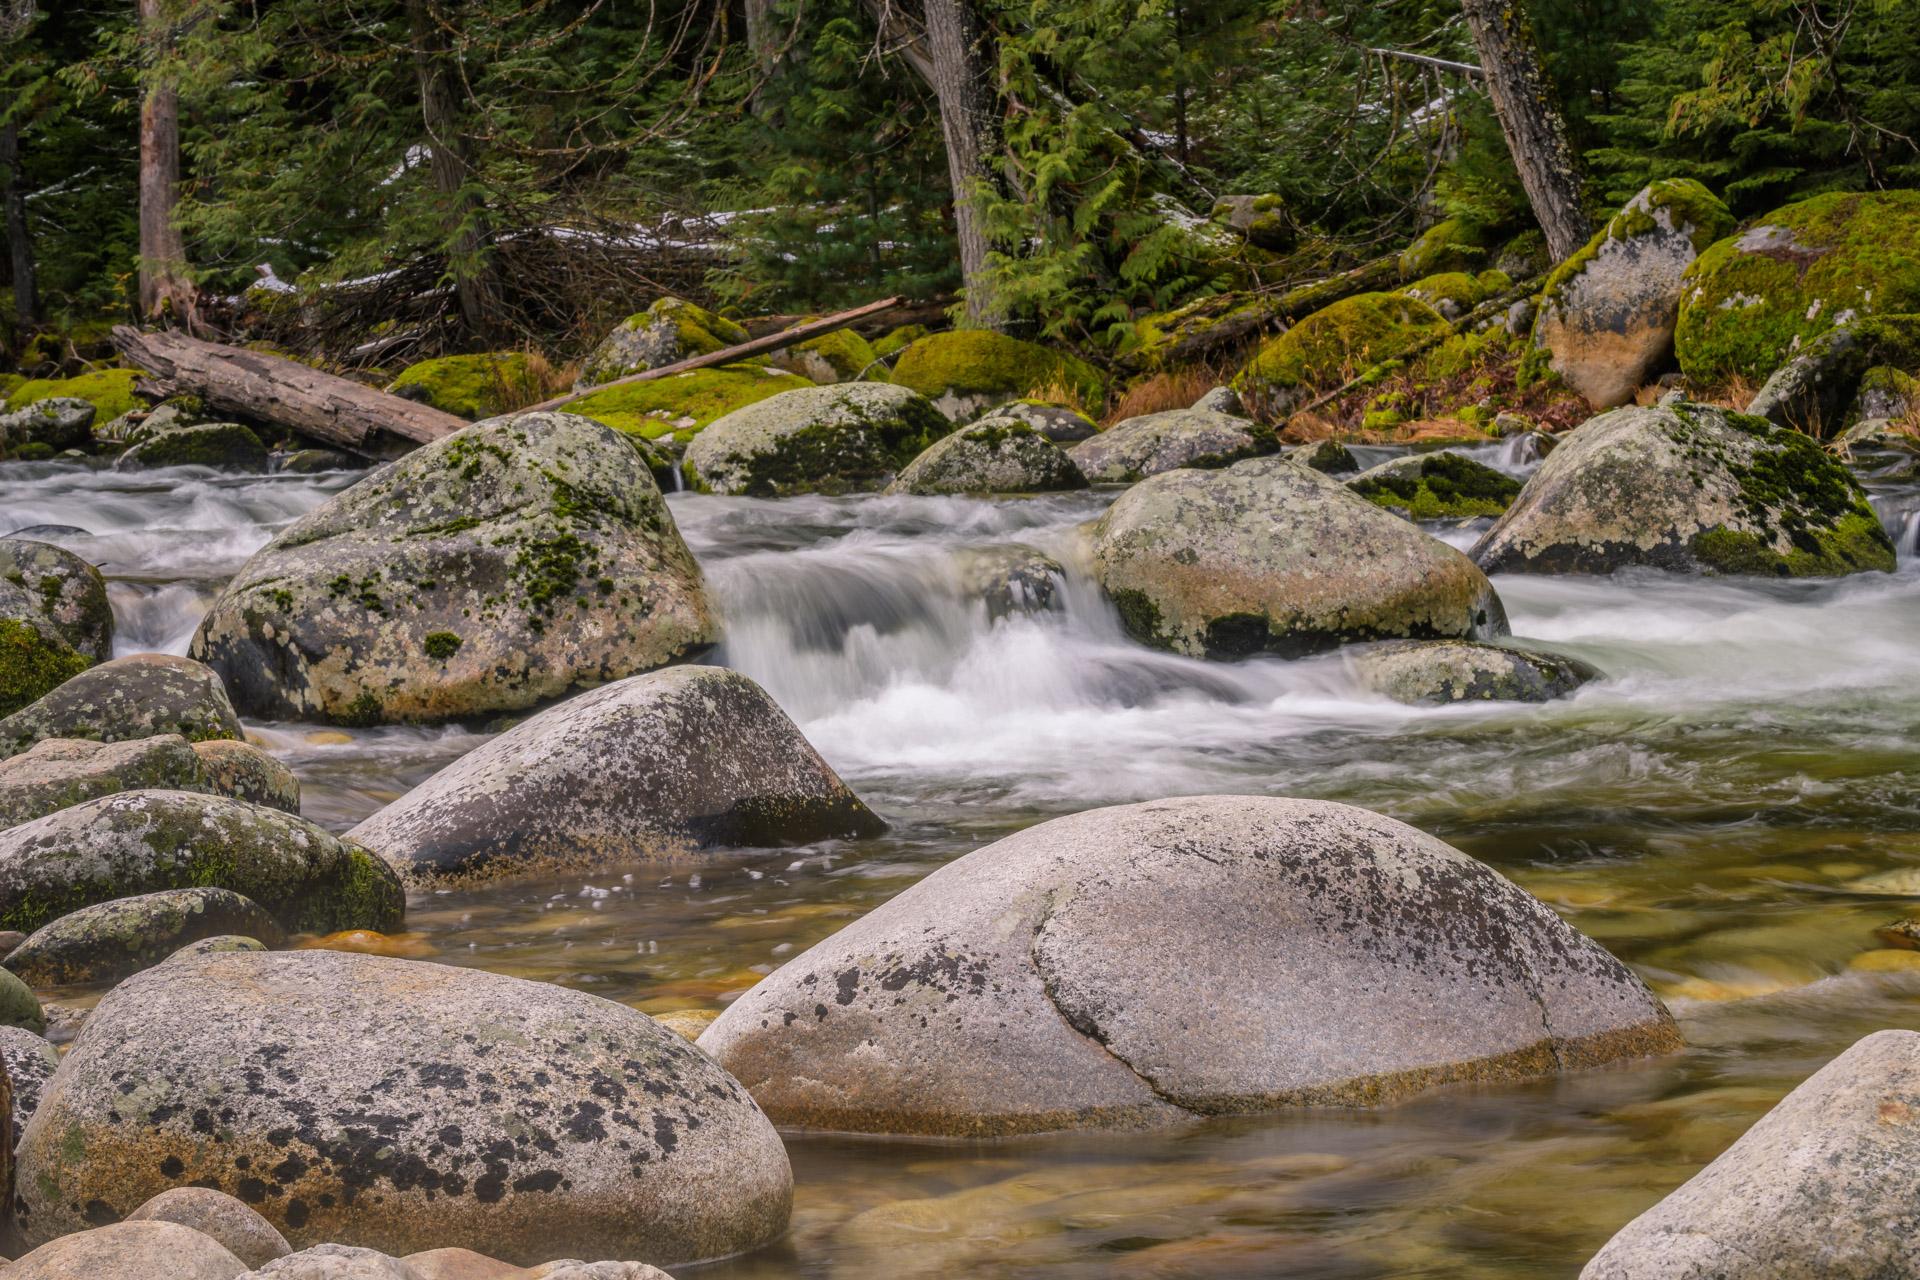 Mid-stream granite boulders